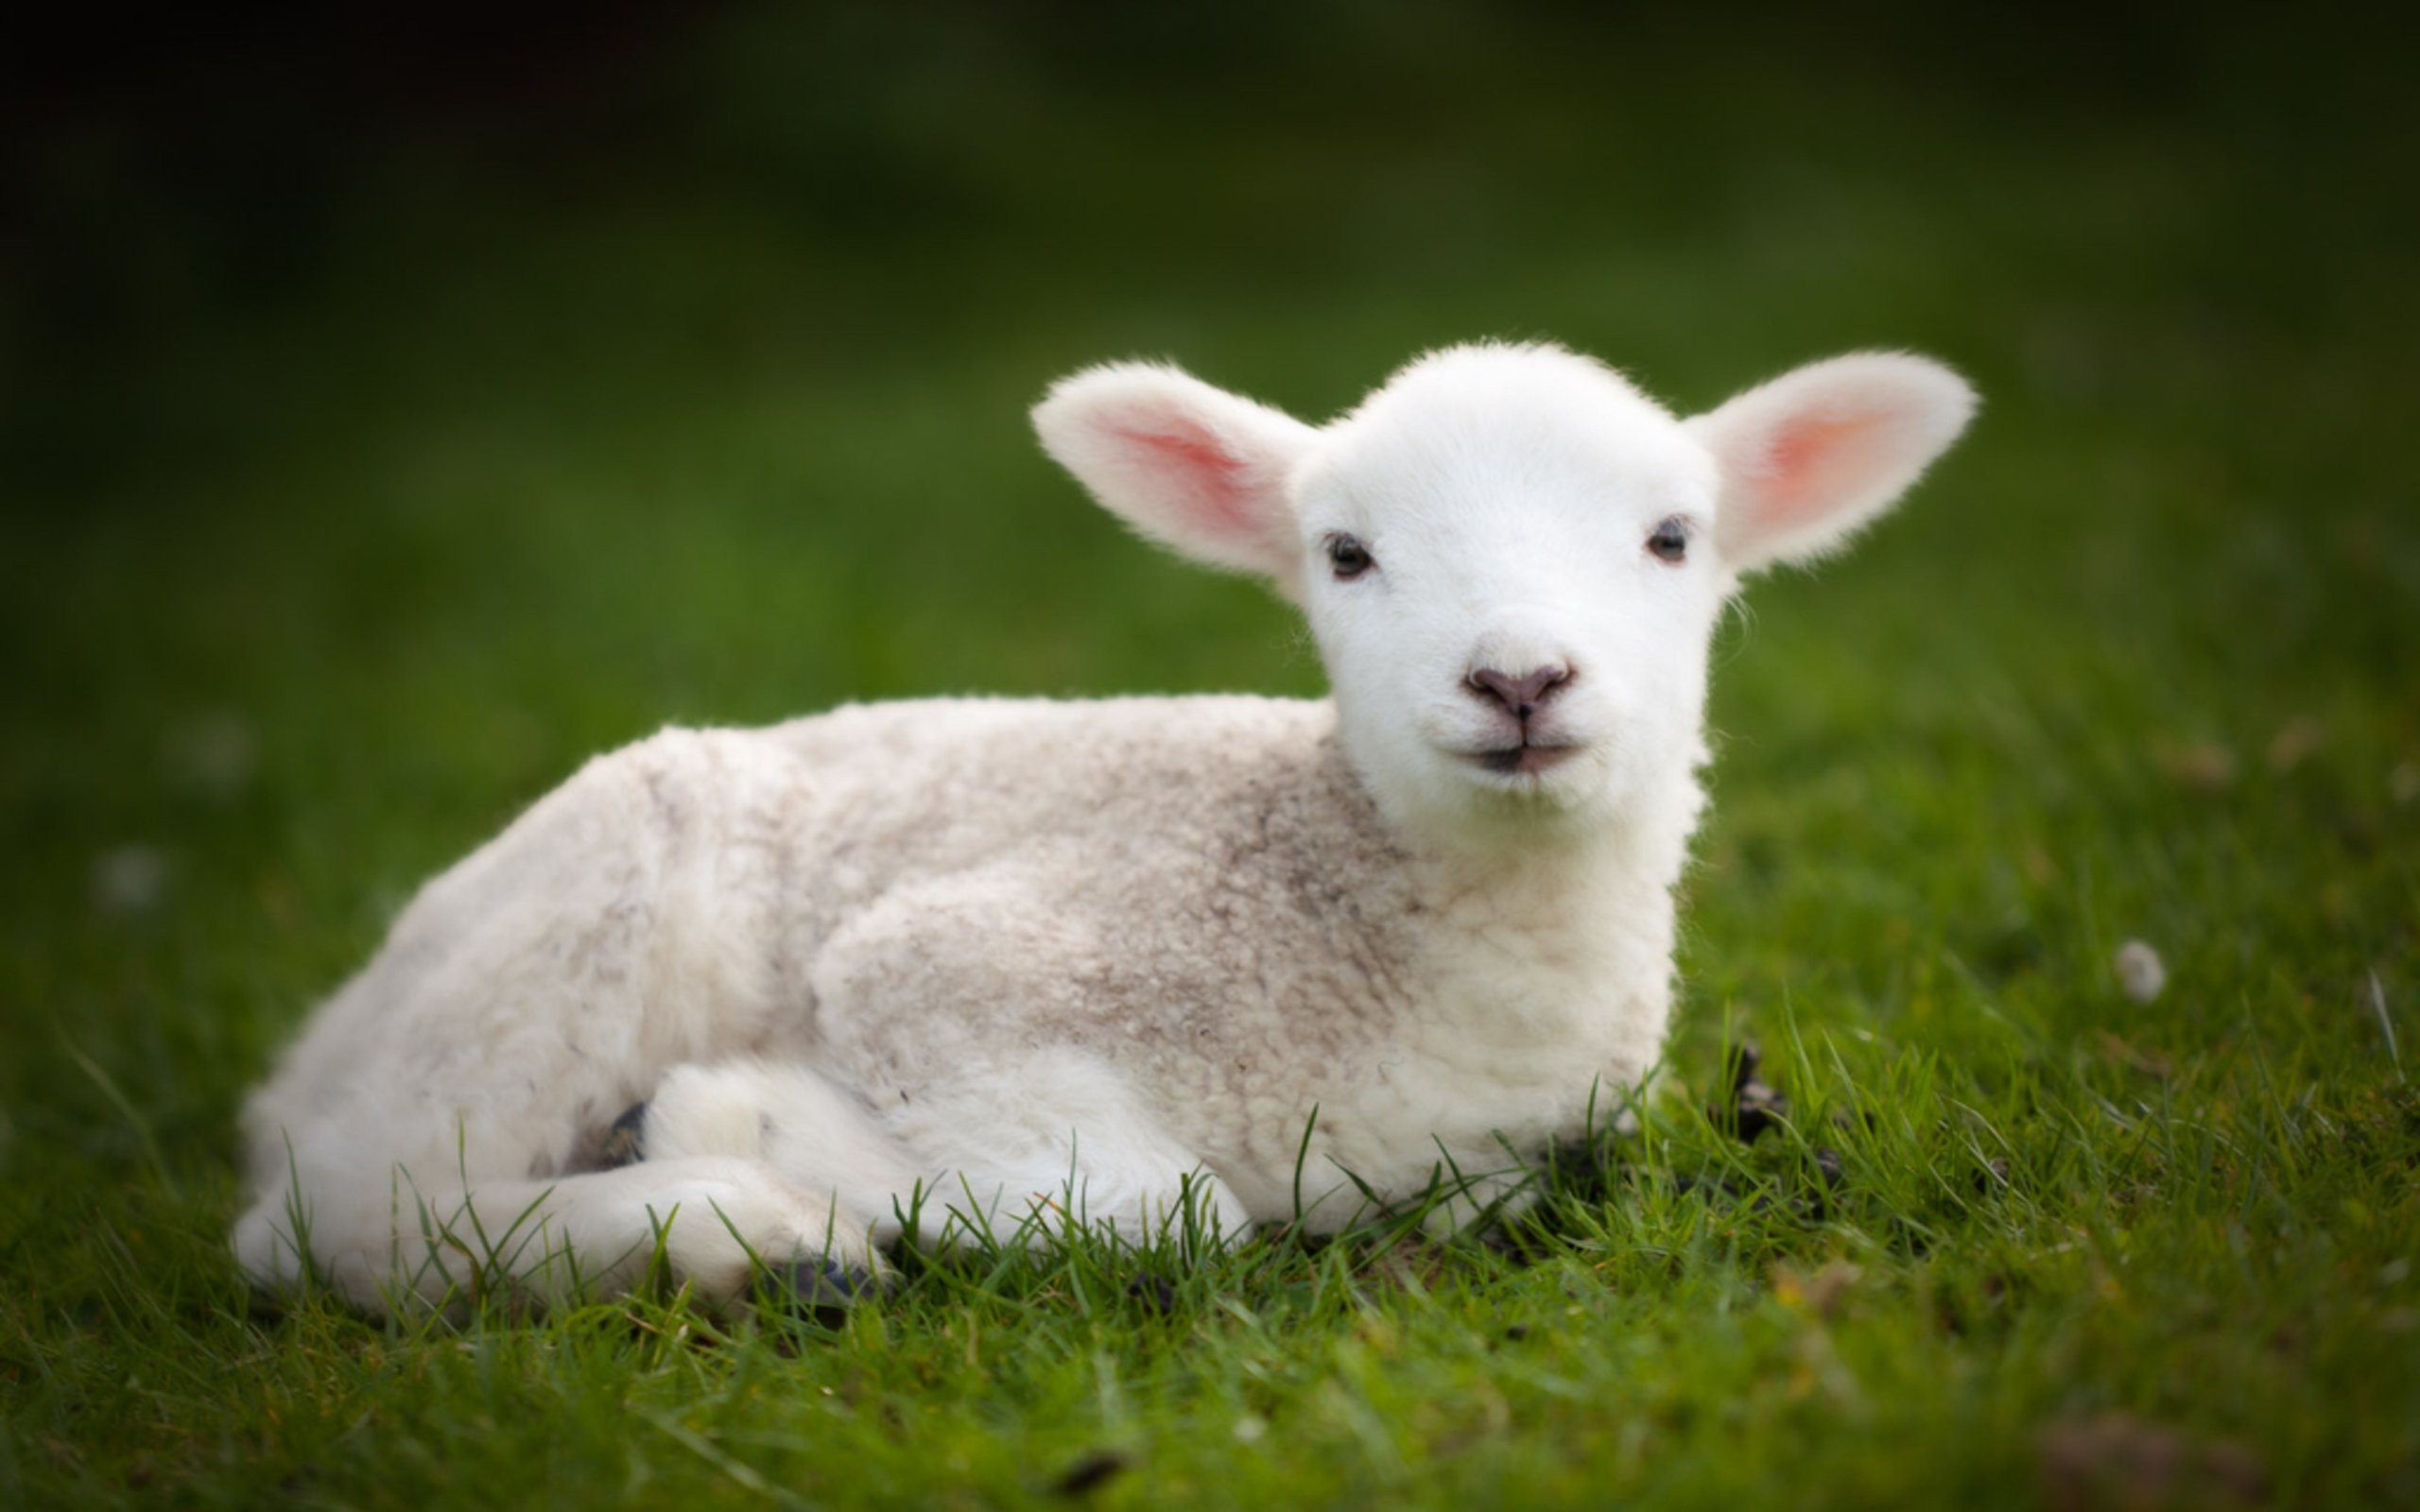 Cute Cow Wallpaper (45+ images) (2560 x 1600 Pixel)